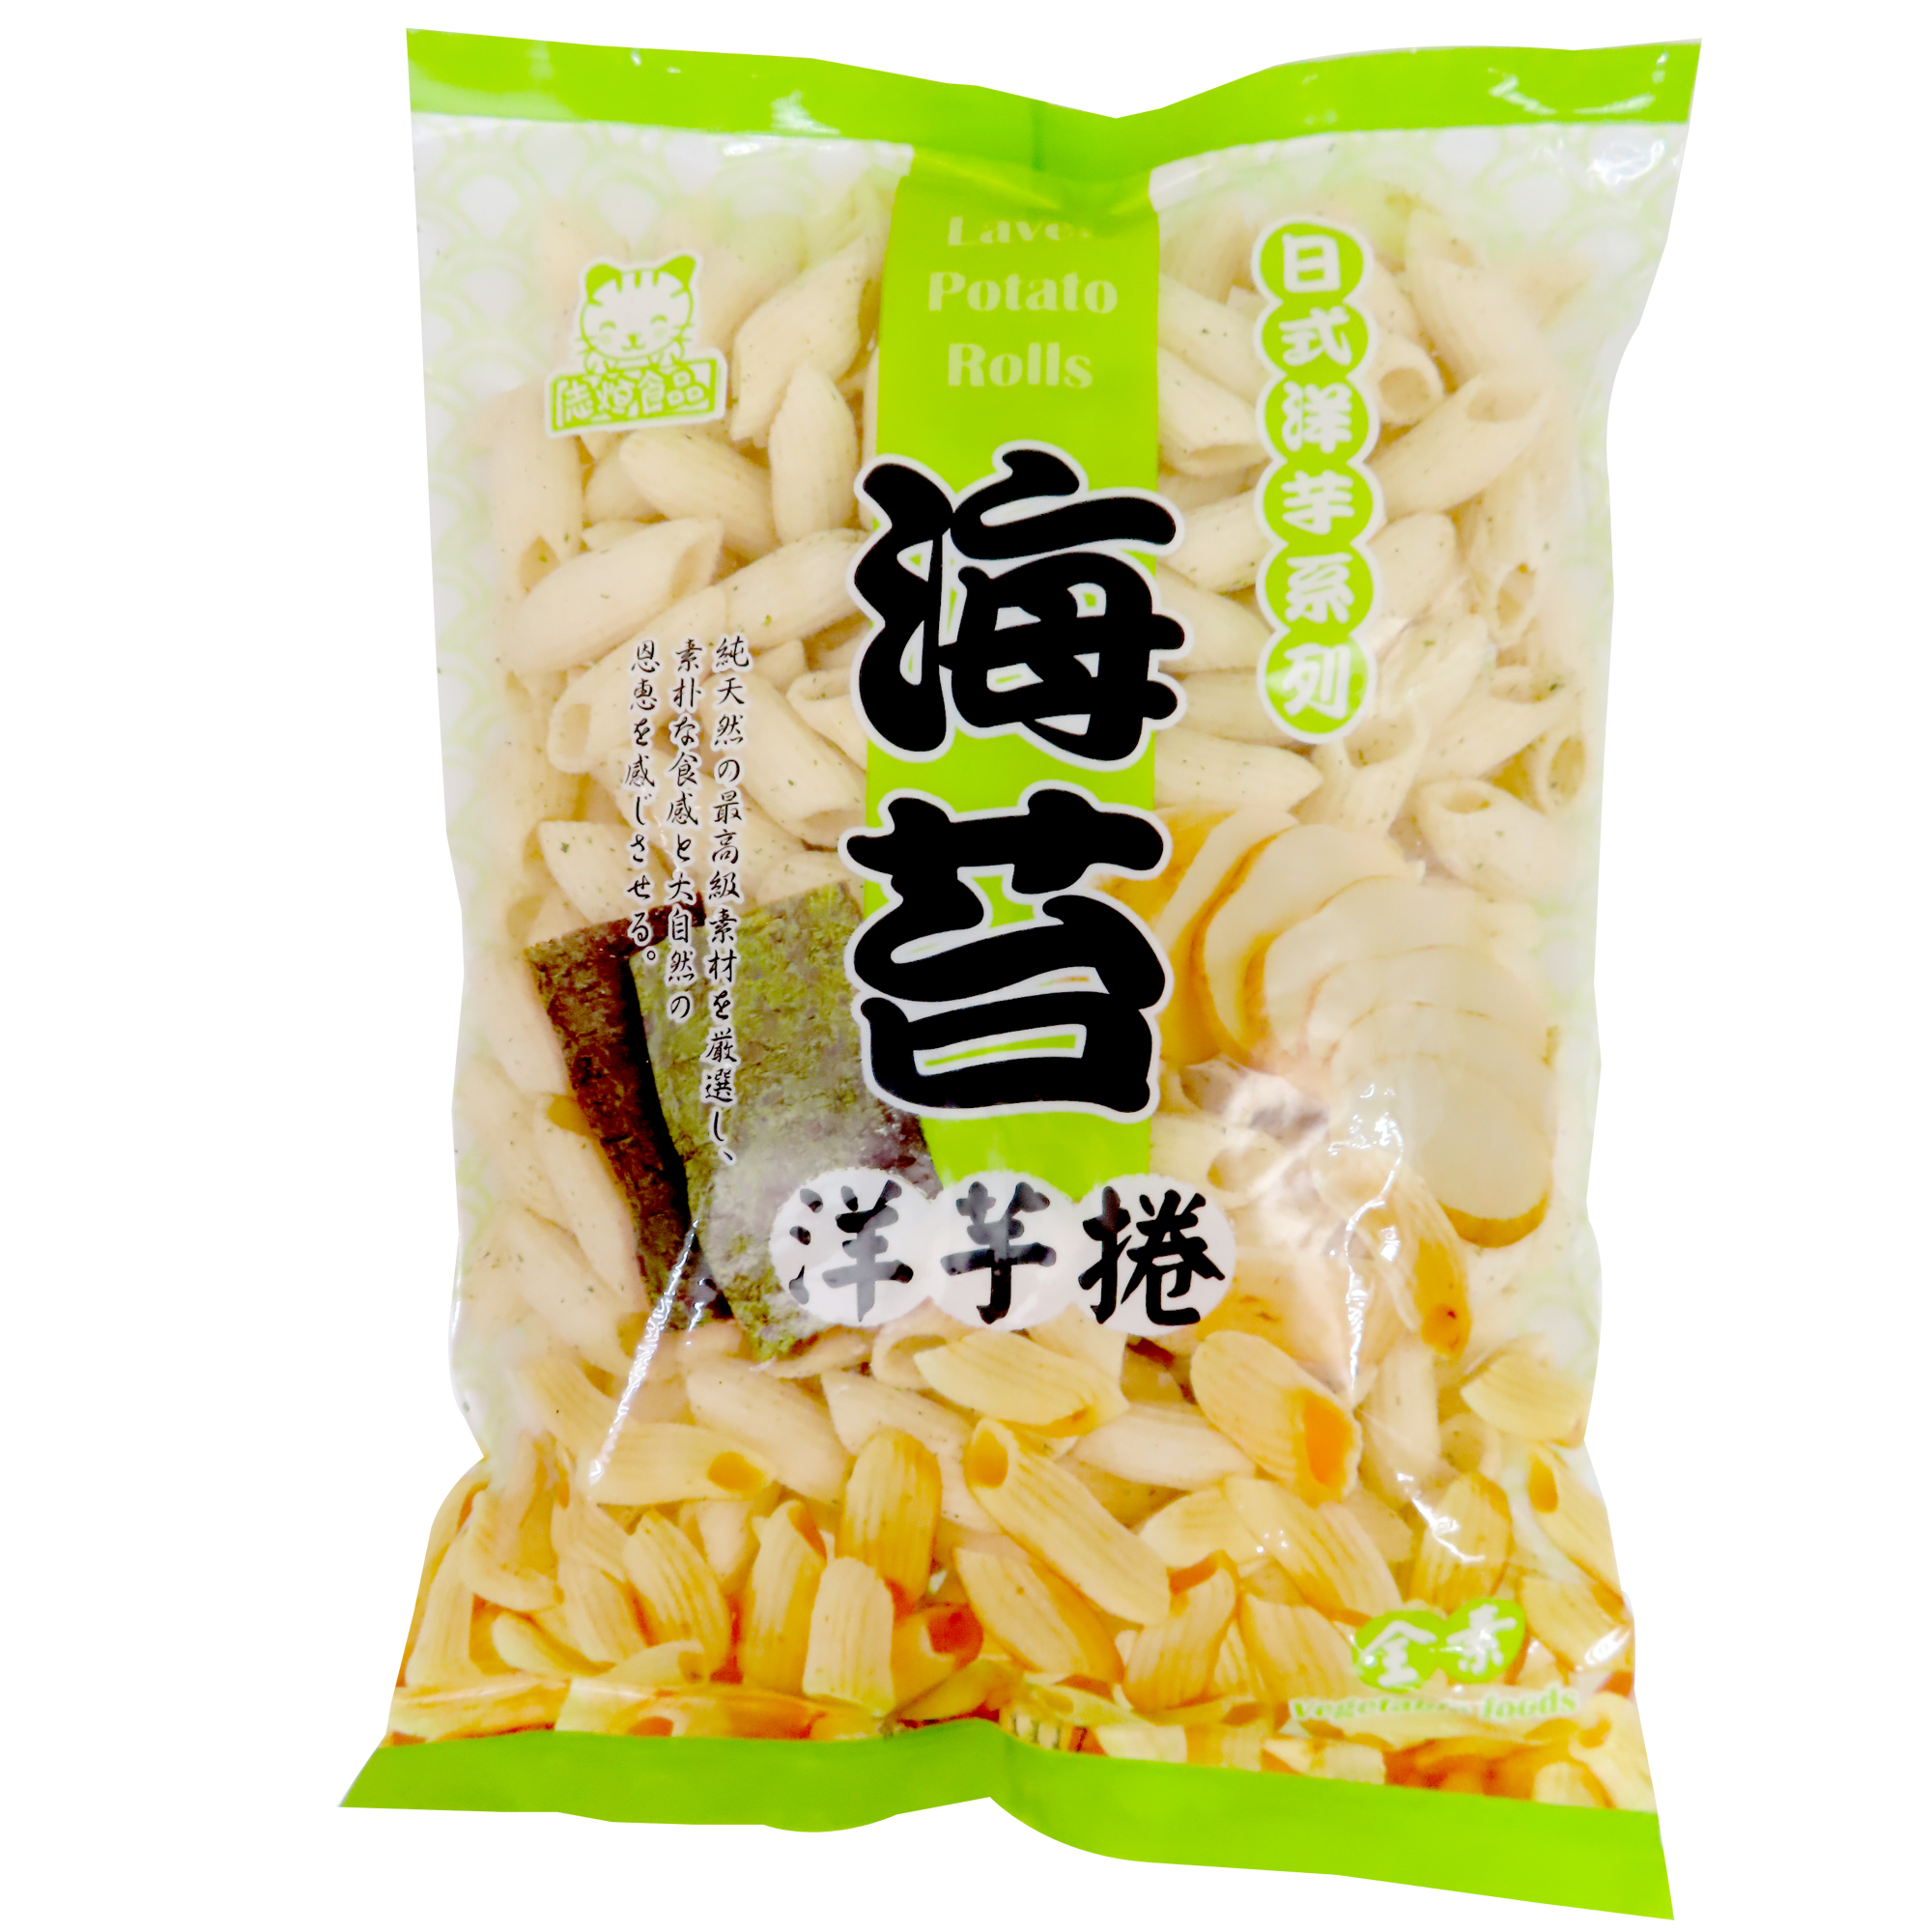 Image Laver Potato Rolls 志恒 - 海苔洋芋捲 180grams